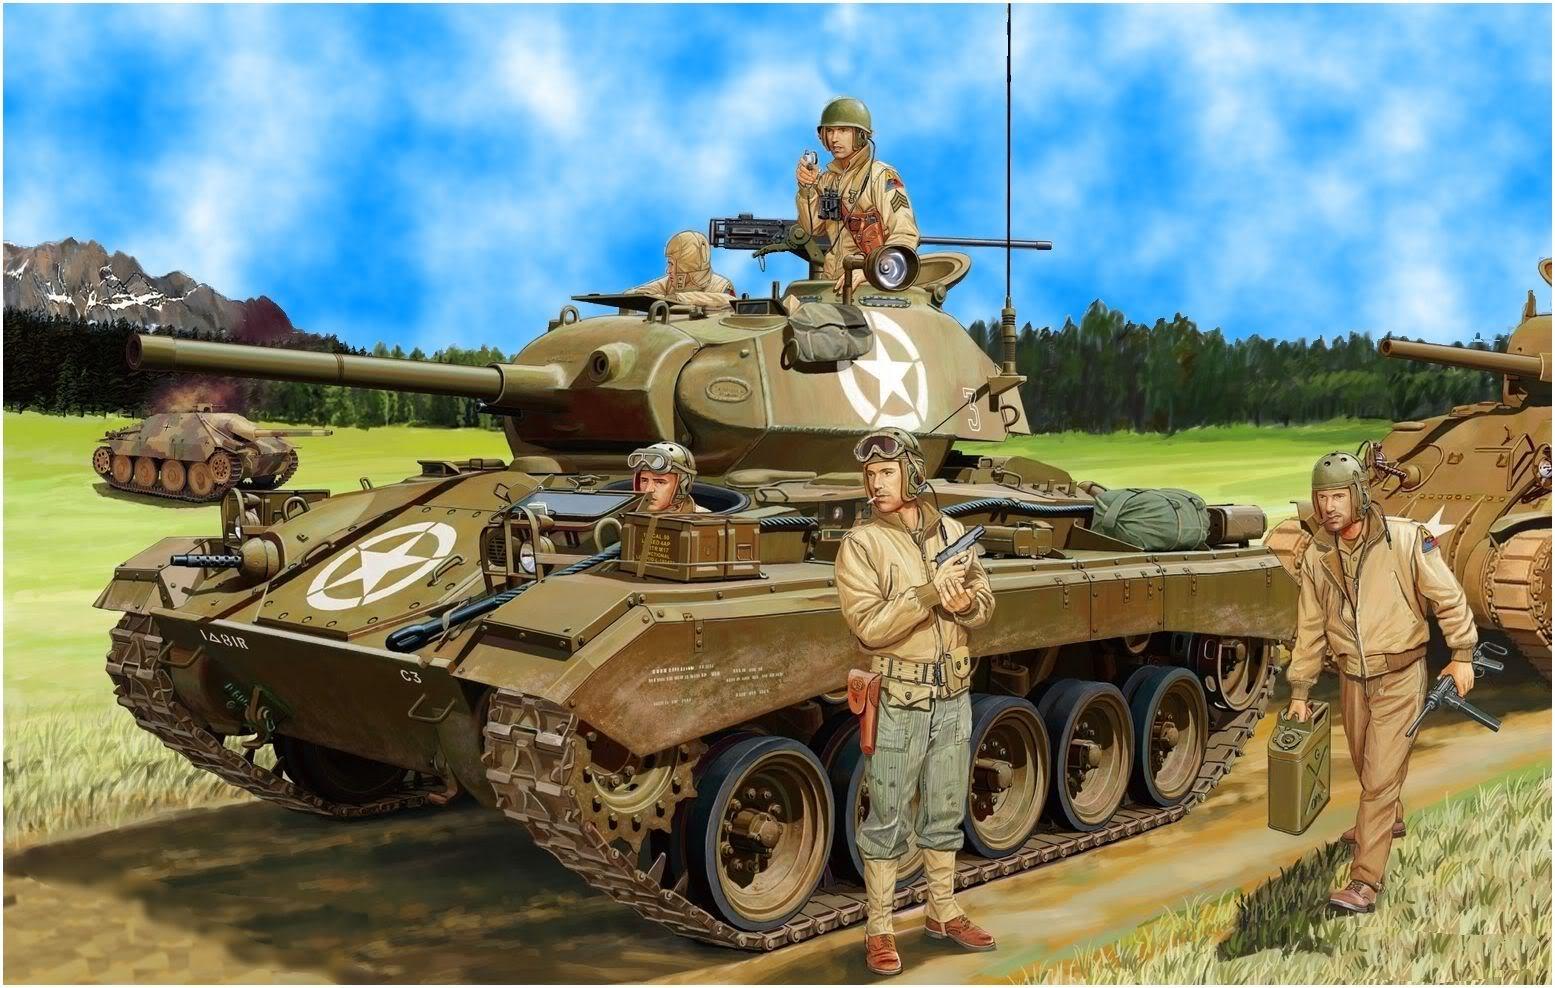 Wrobel Jaroslaw. Лёгкий танк PzKpfw 35(t).